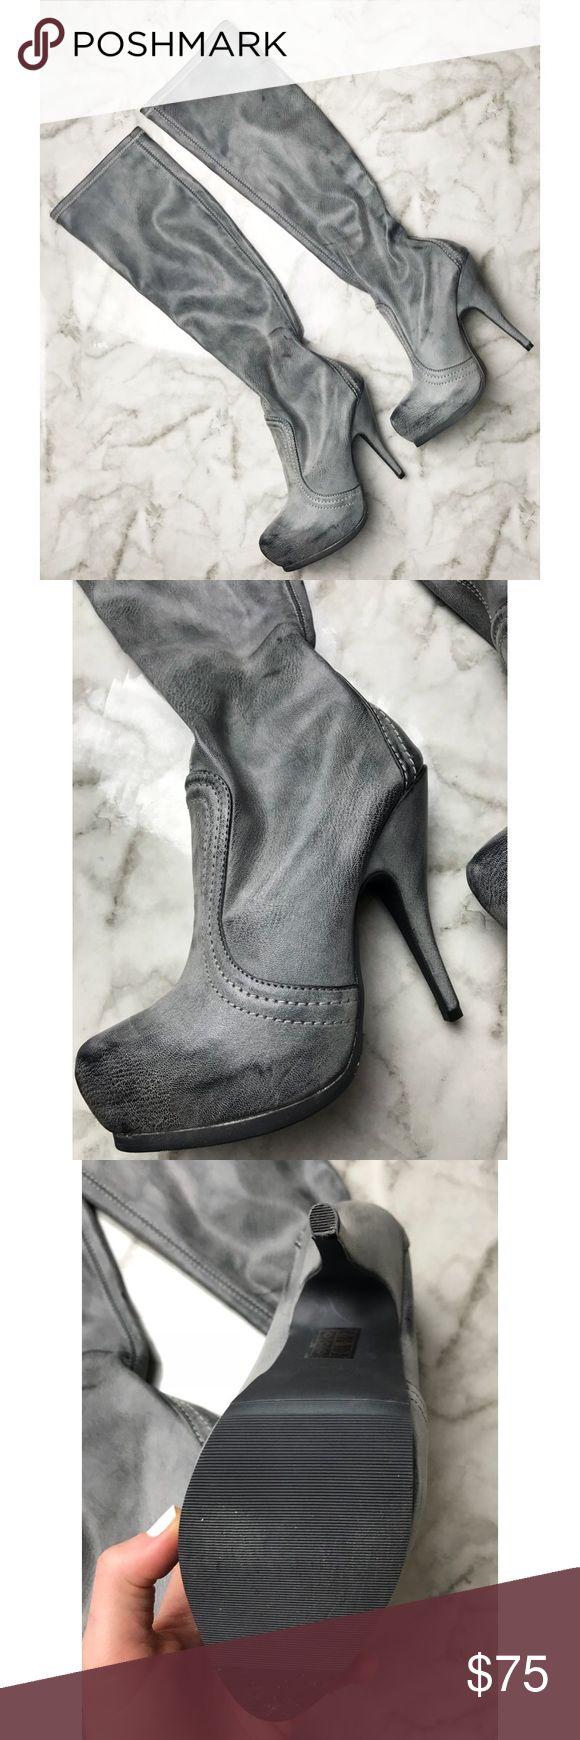 Max Studio • NWOT Grey Heeled Boots Max Studio • NWOT Grey Heeled Boots Never worn  Cute duel toned grey material Slip on, no zipper  Size 7 Max Studio Shoes Heeled Boots